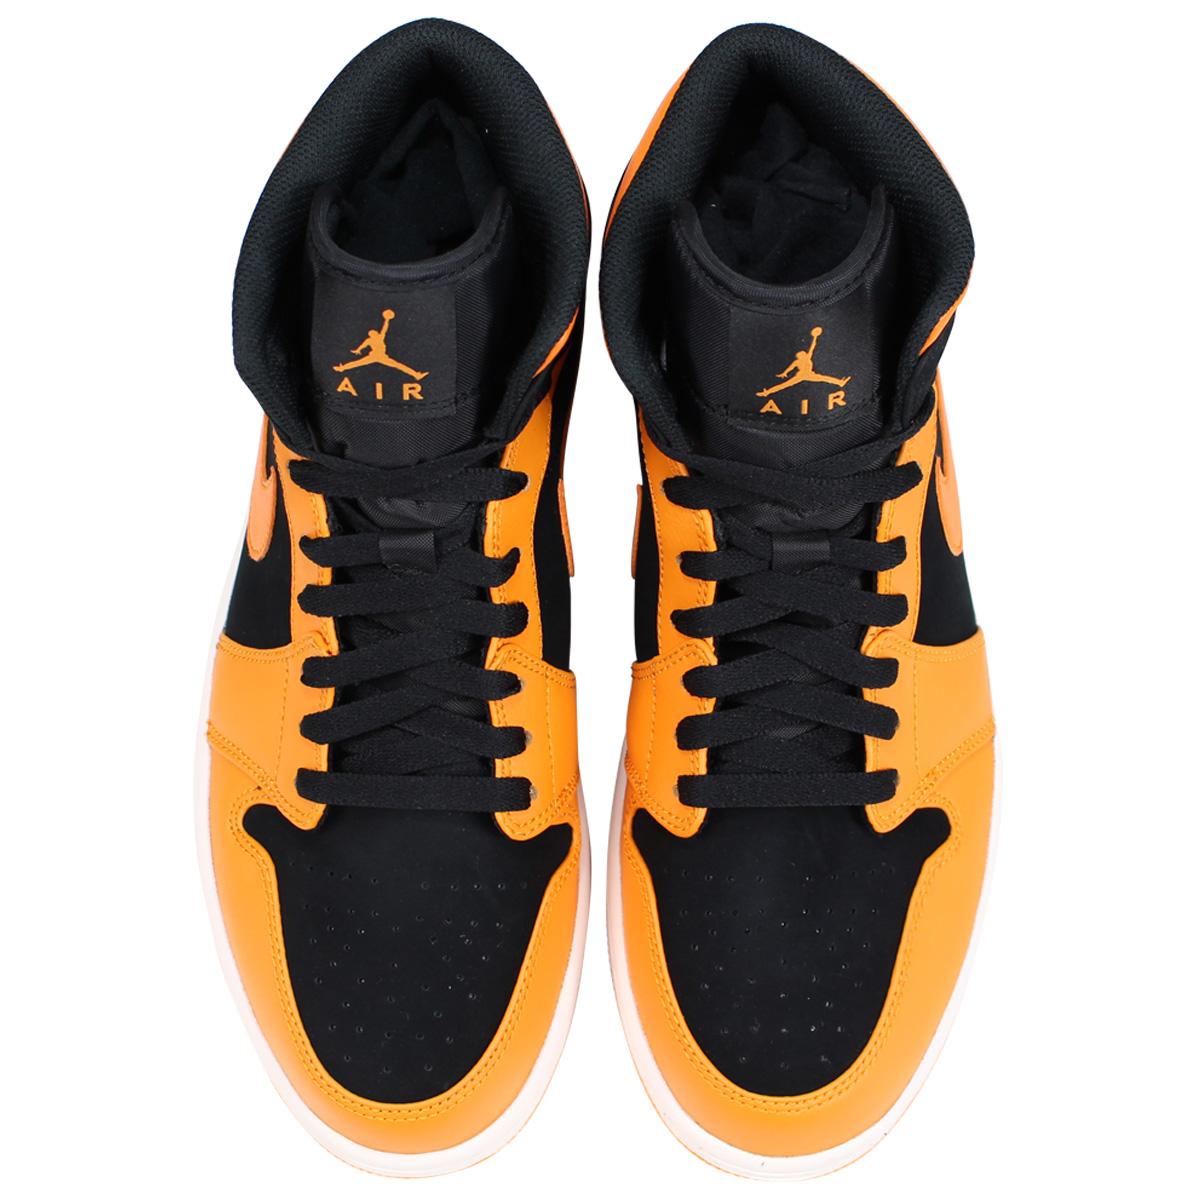 new product 48cb7 1ab76 NIKE Nike Air Jordan 1 sneakers men AIR JORDAN 1 MID 554,724-081 orange   load planned Shinnyu load in reservation product 8 3 containing